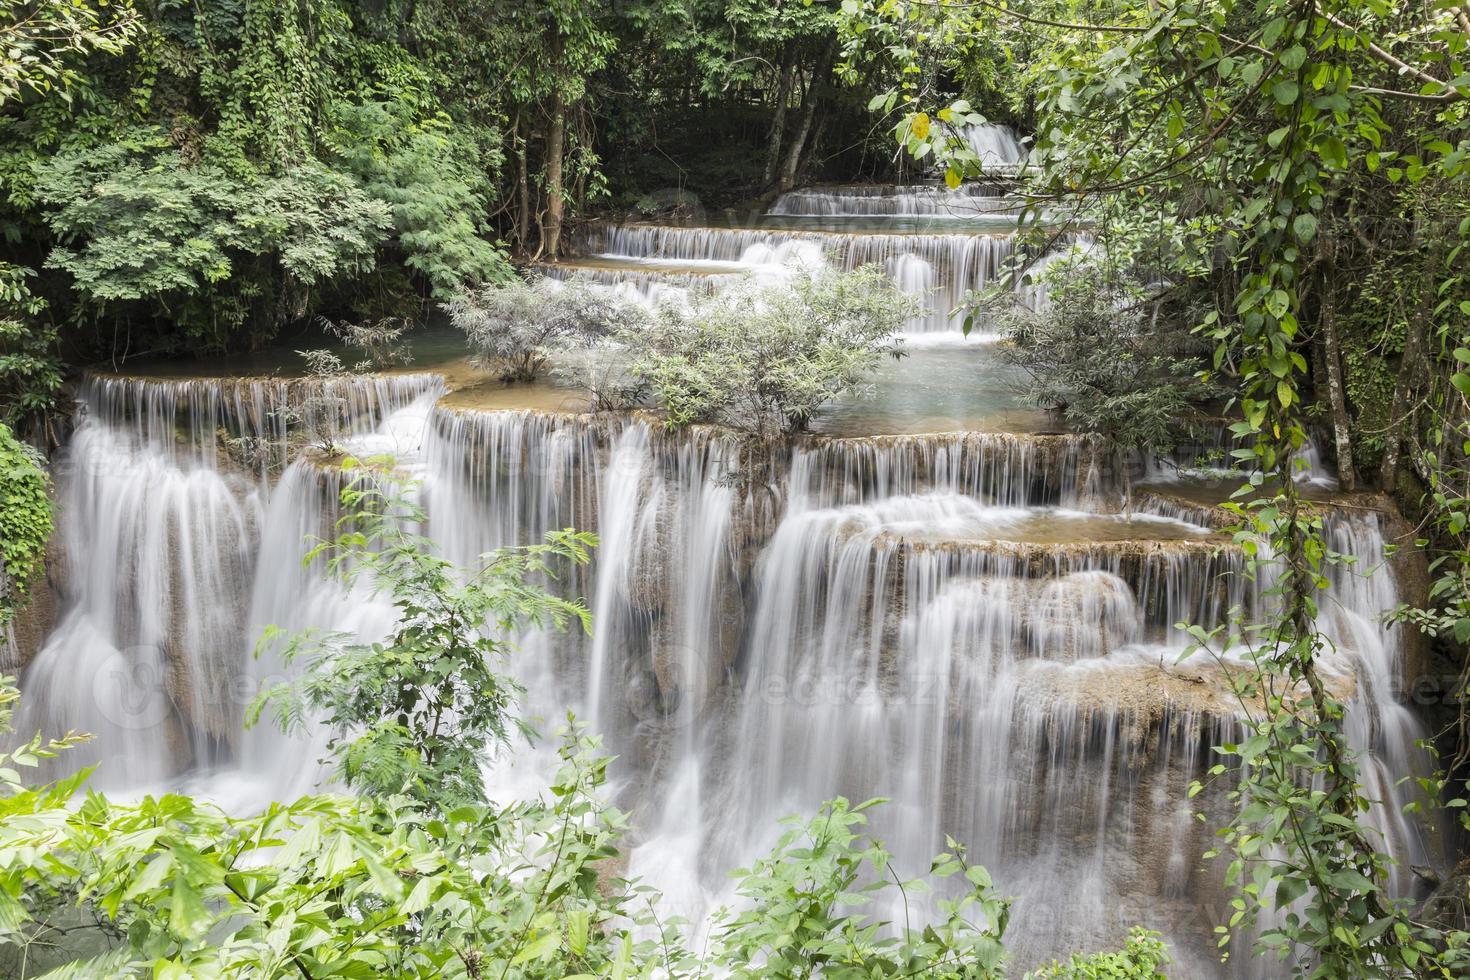 Huai Mae Khamin waterfall in Kanchanaburi photo